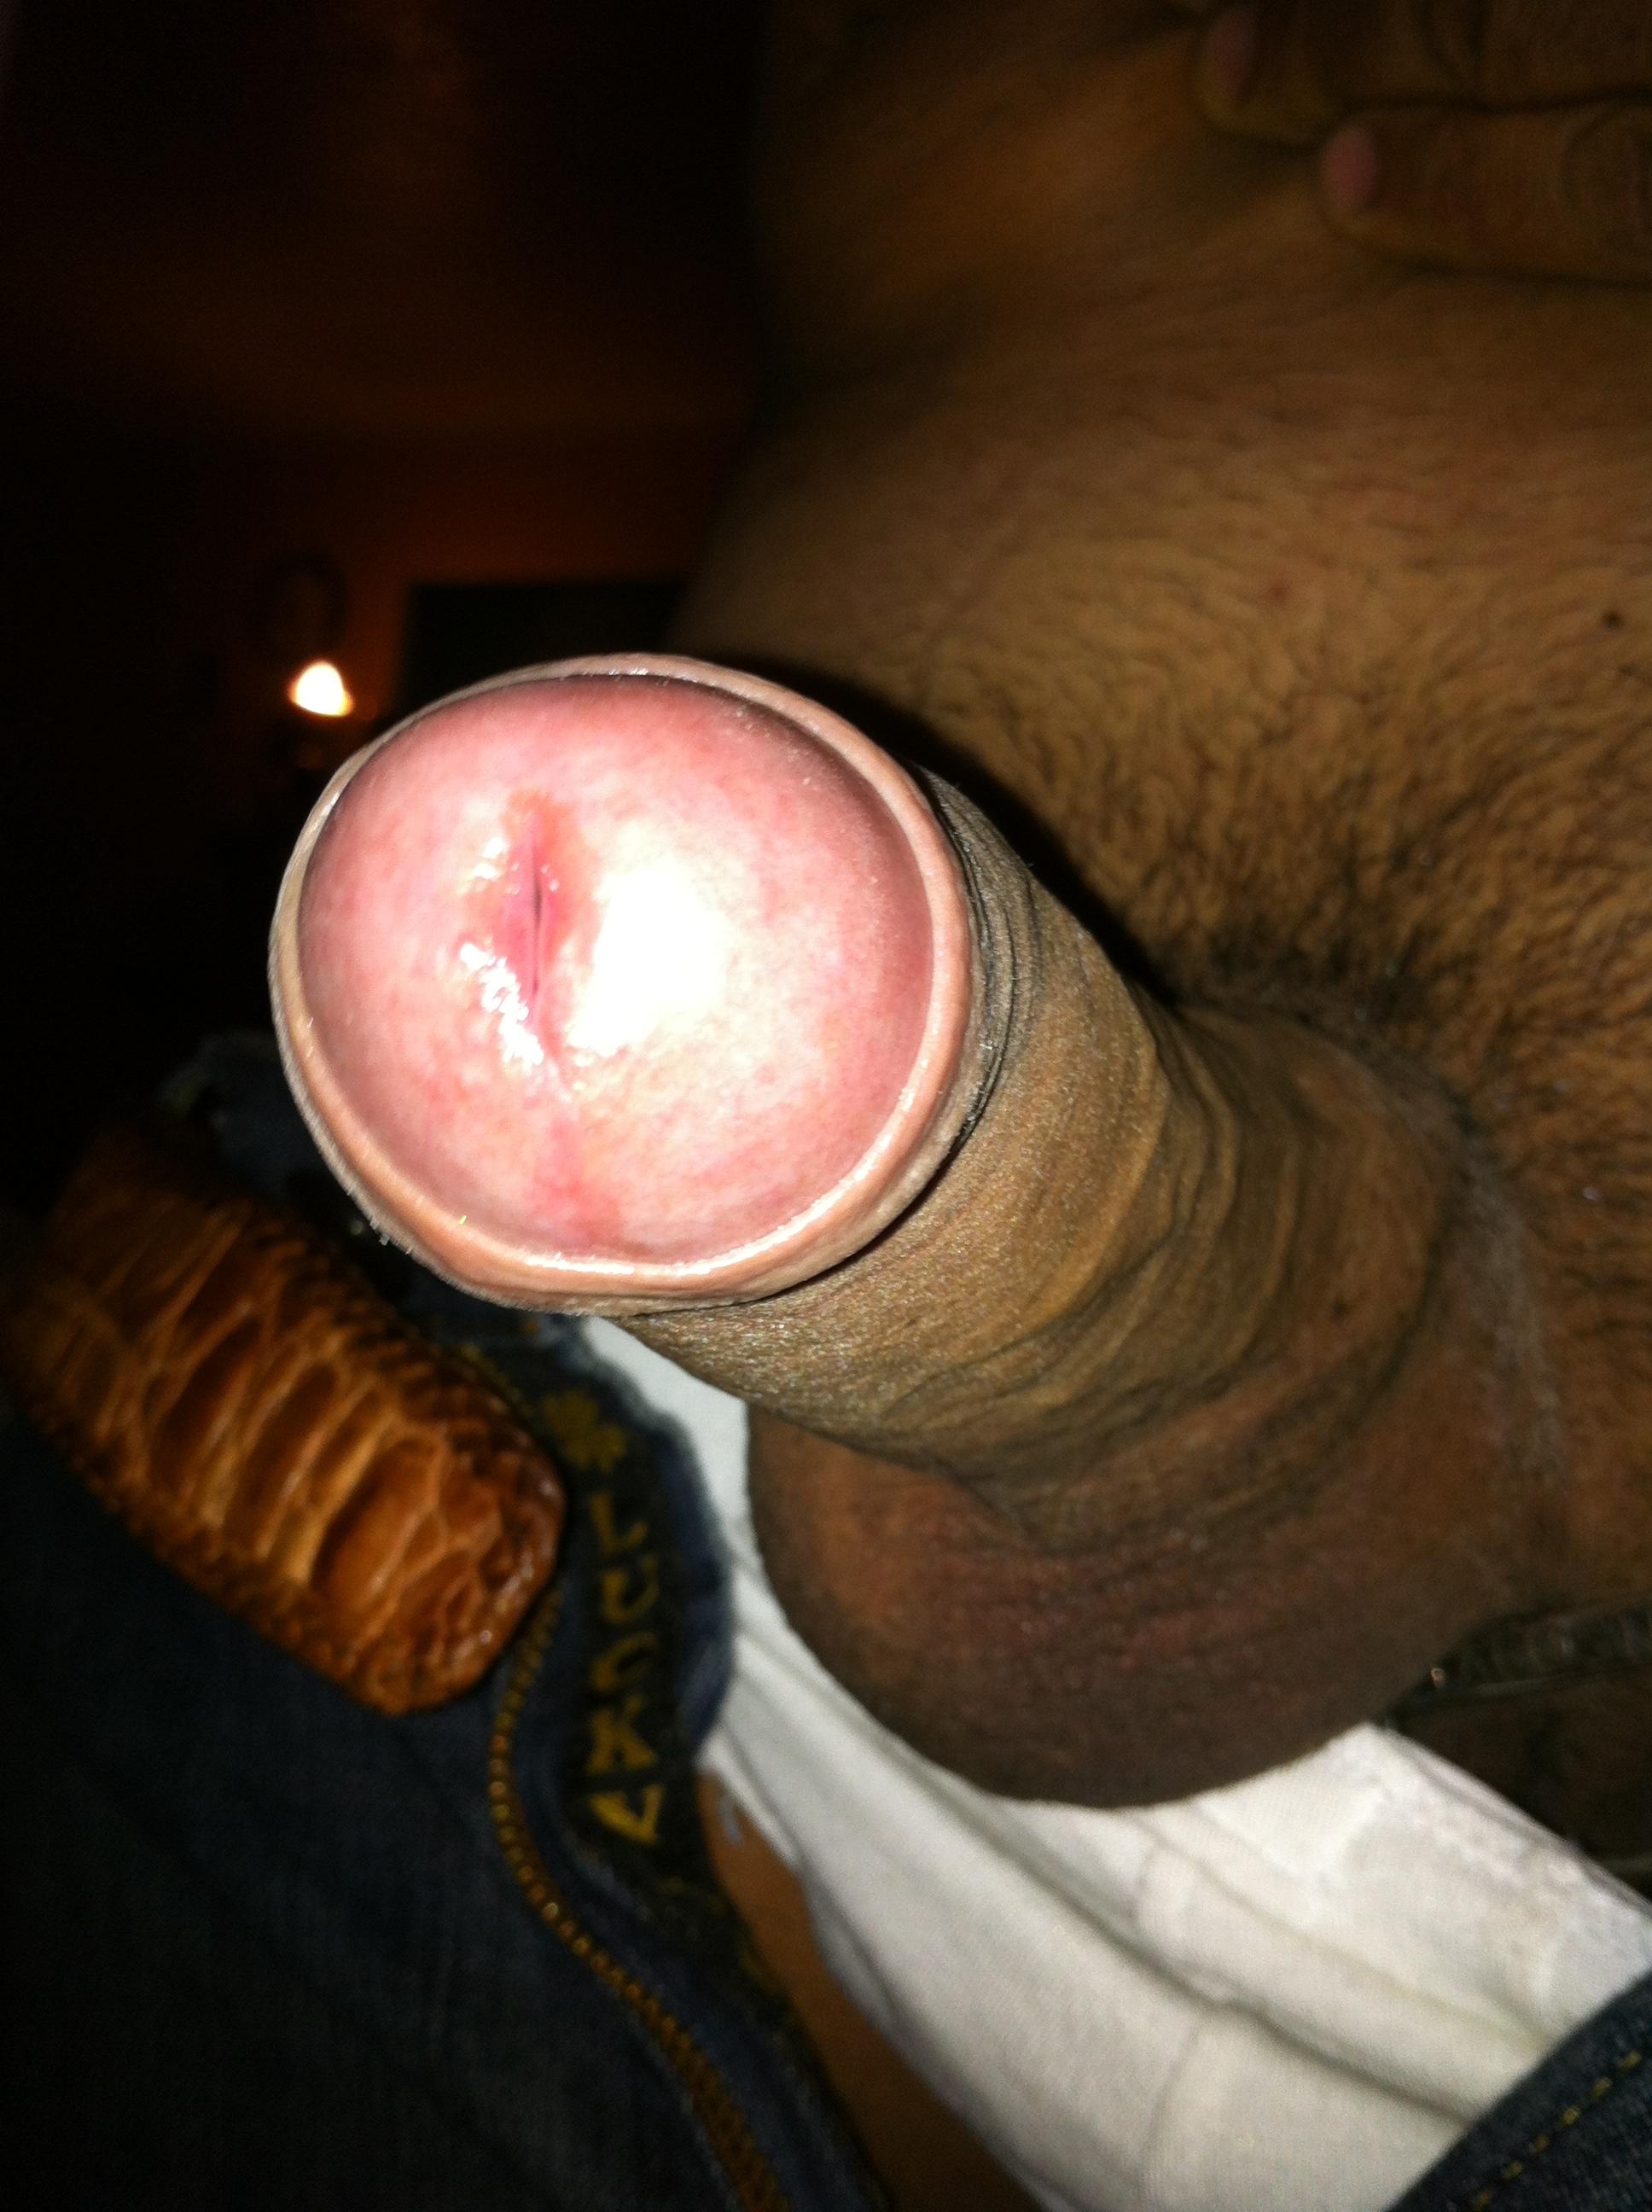 pinchila69